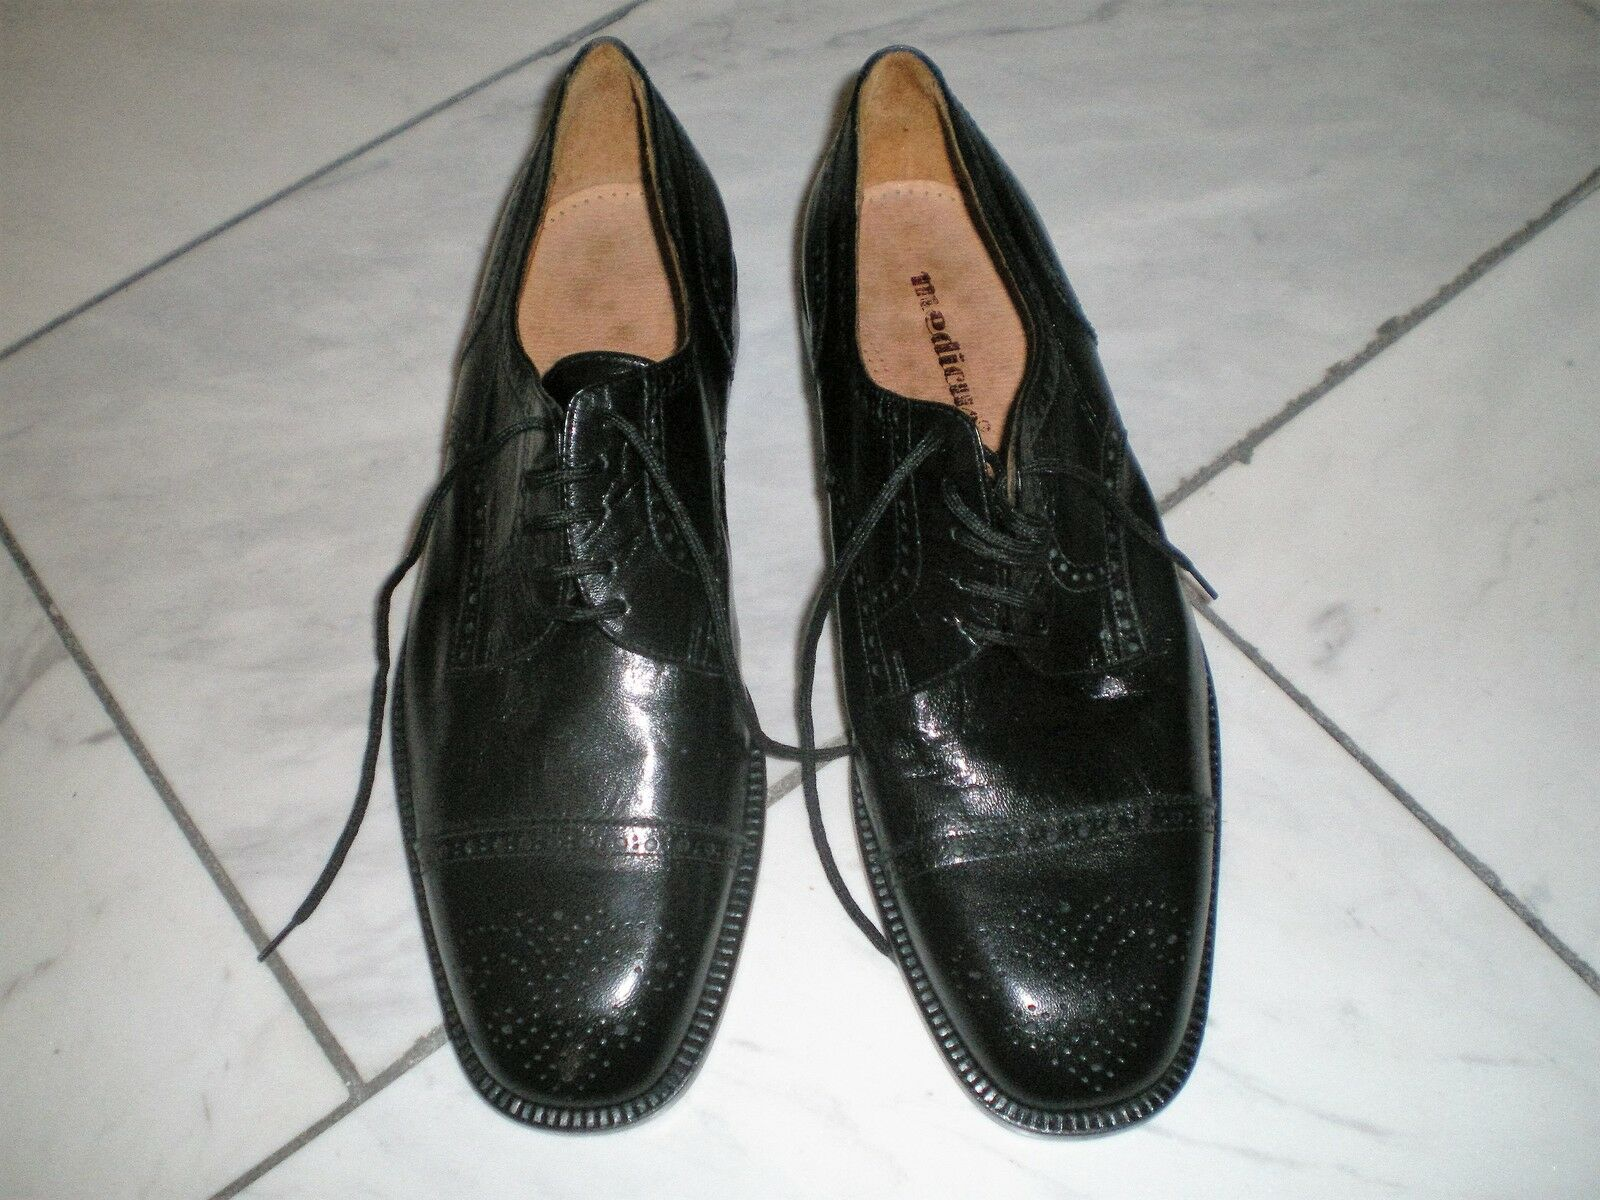 Herren Business-Schuhe,vero cuoio the london , Budapester, schwarz Gr.43